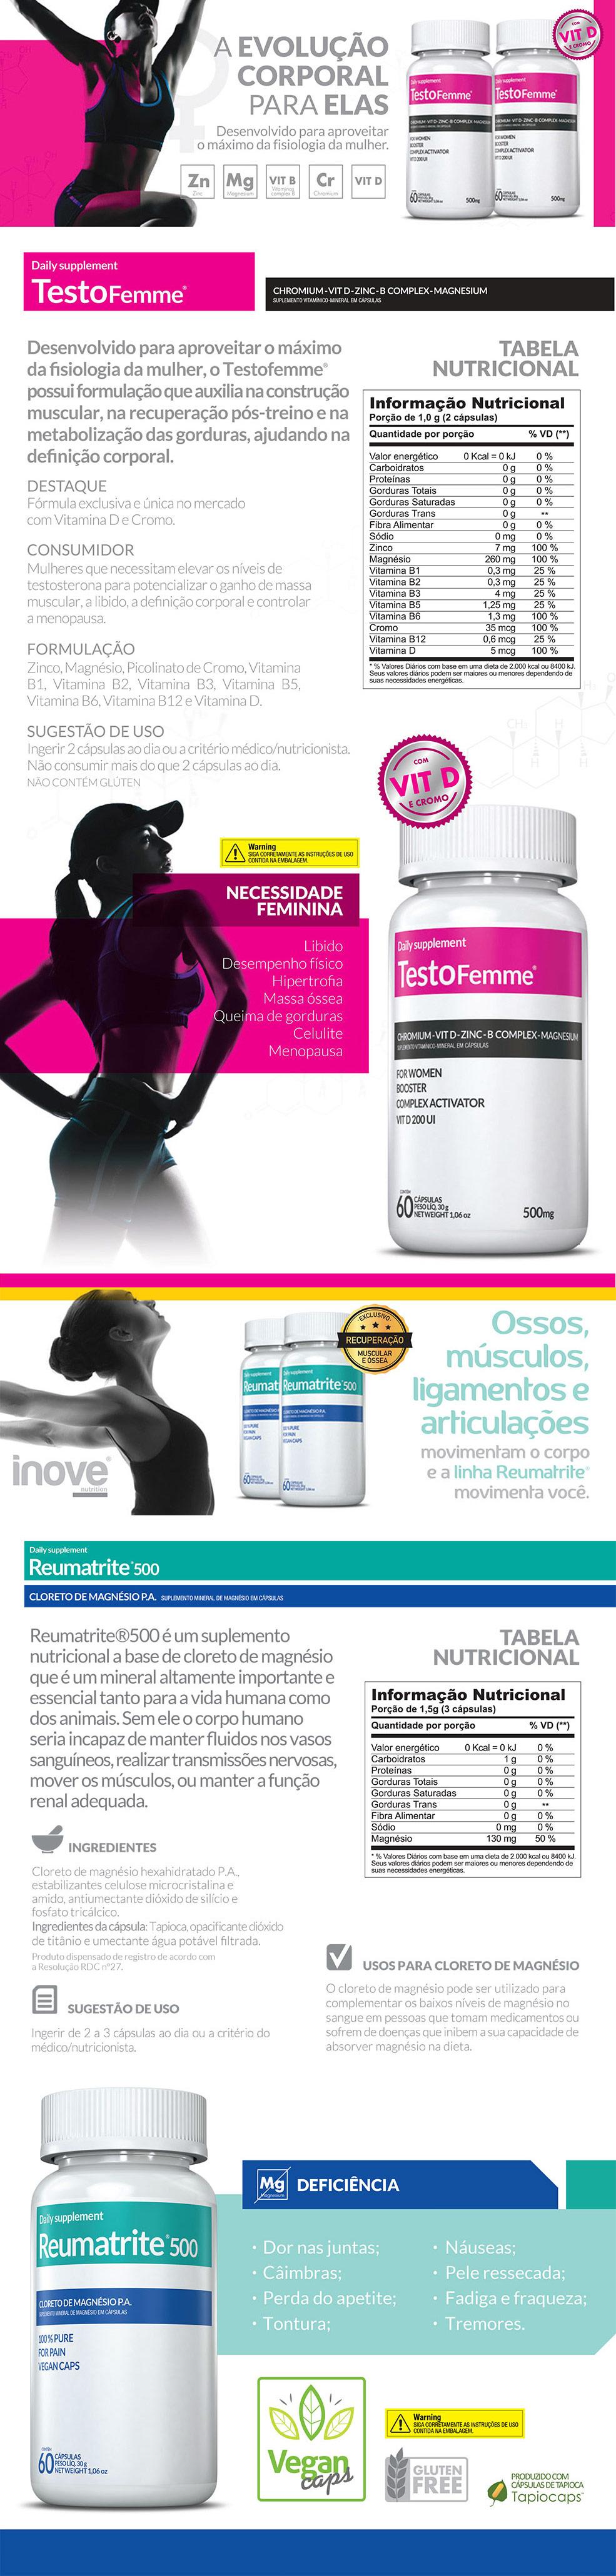 TestoFemme® + Reumatrite® 500 + Squeeze Inove Nutrition